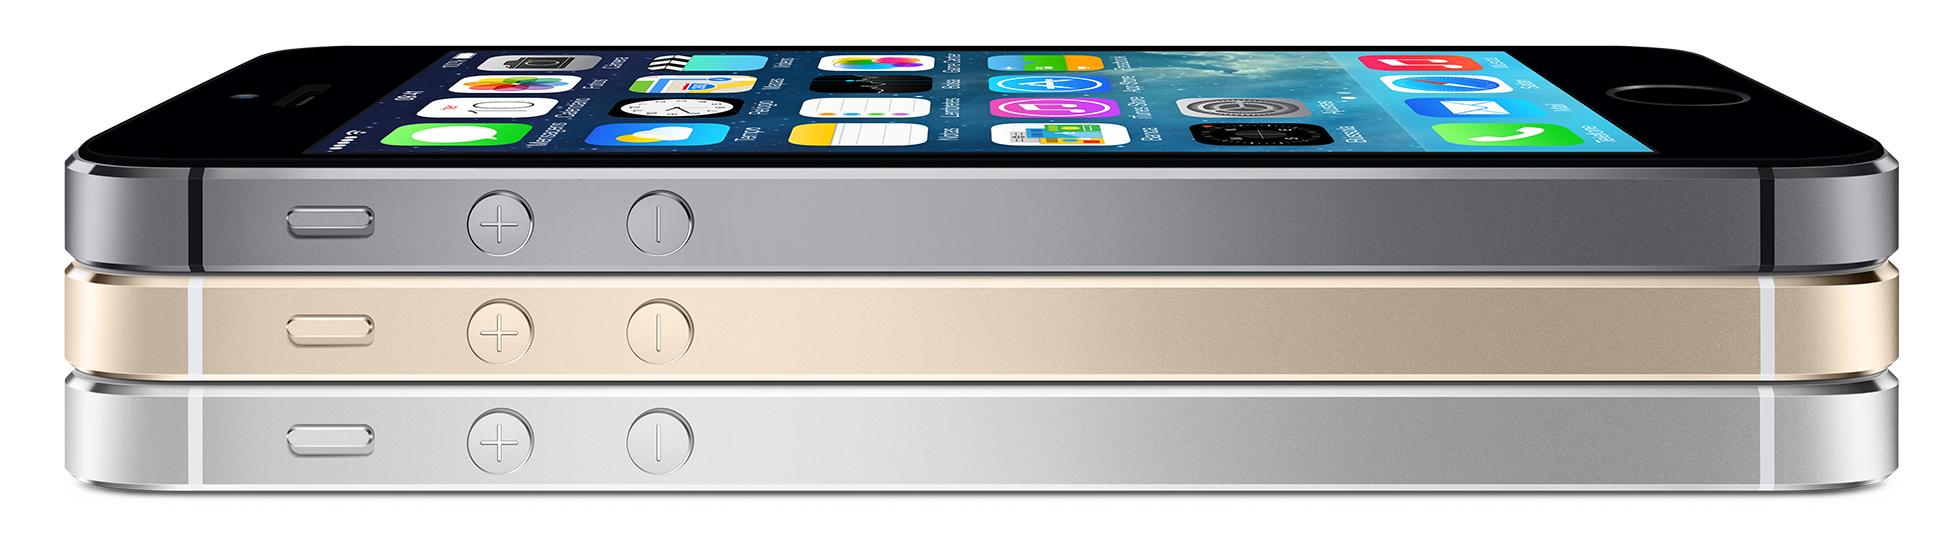 iPhones 5s deitados